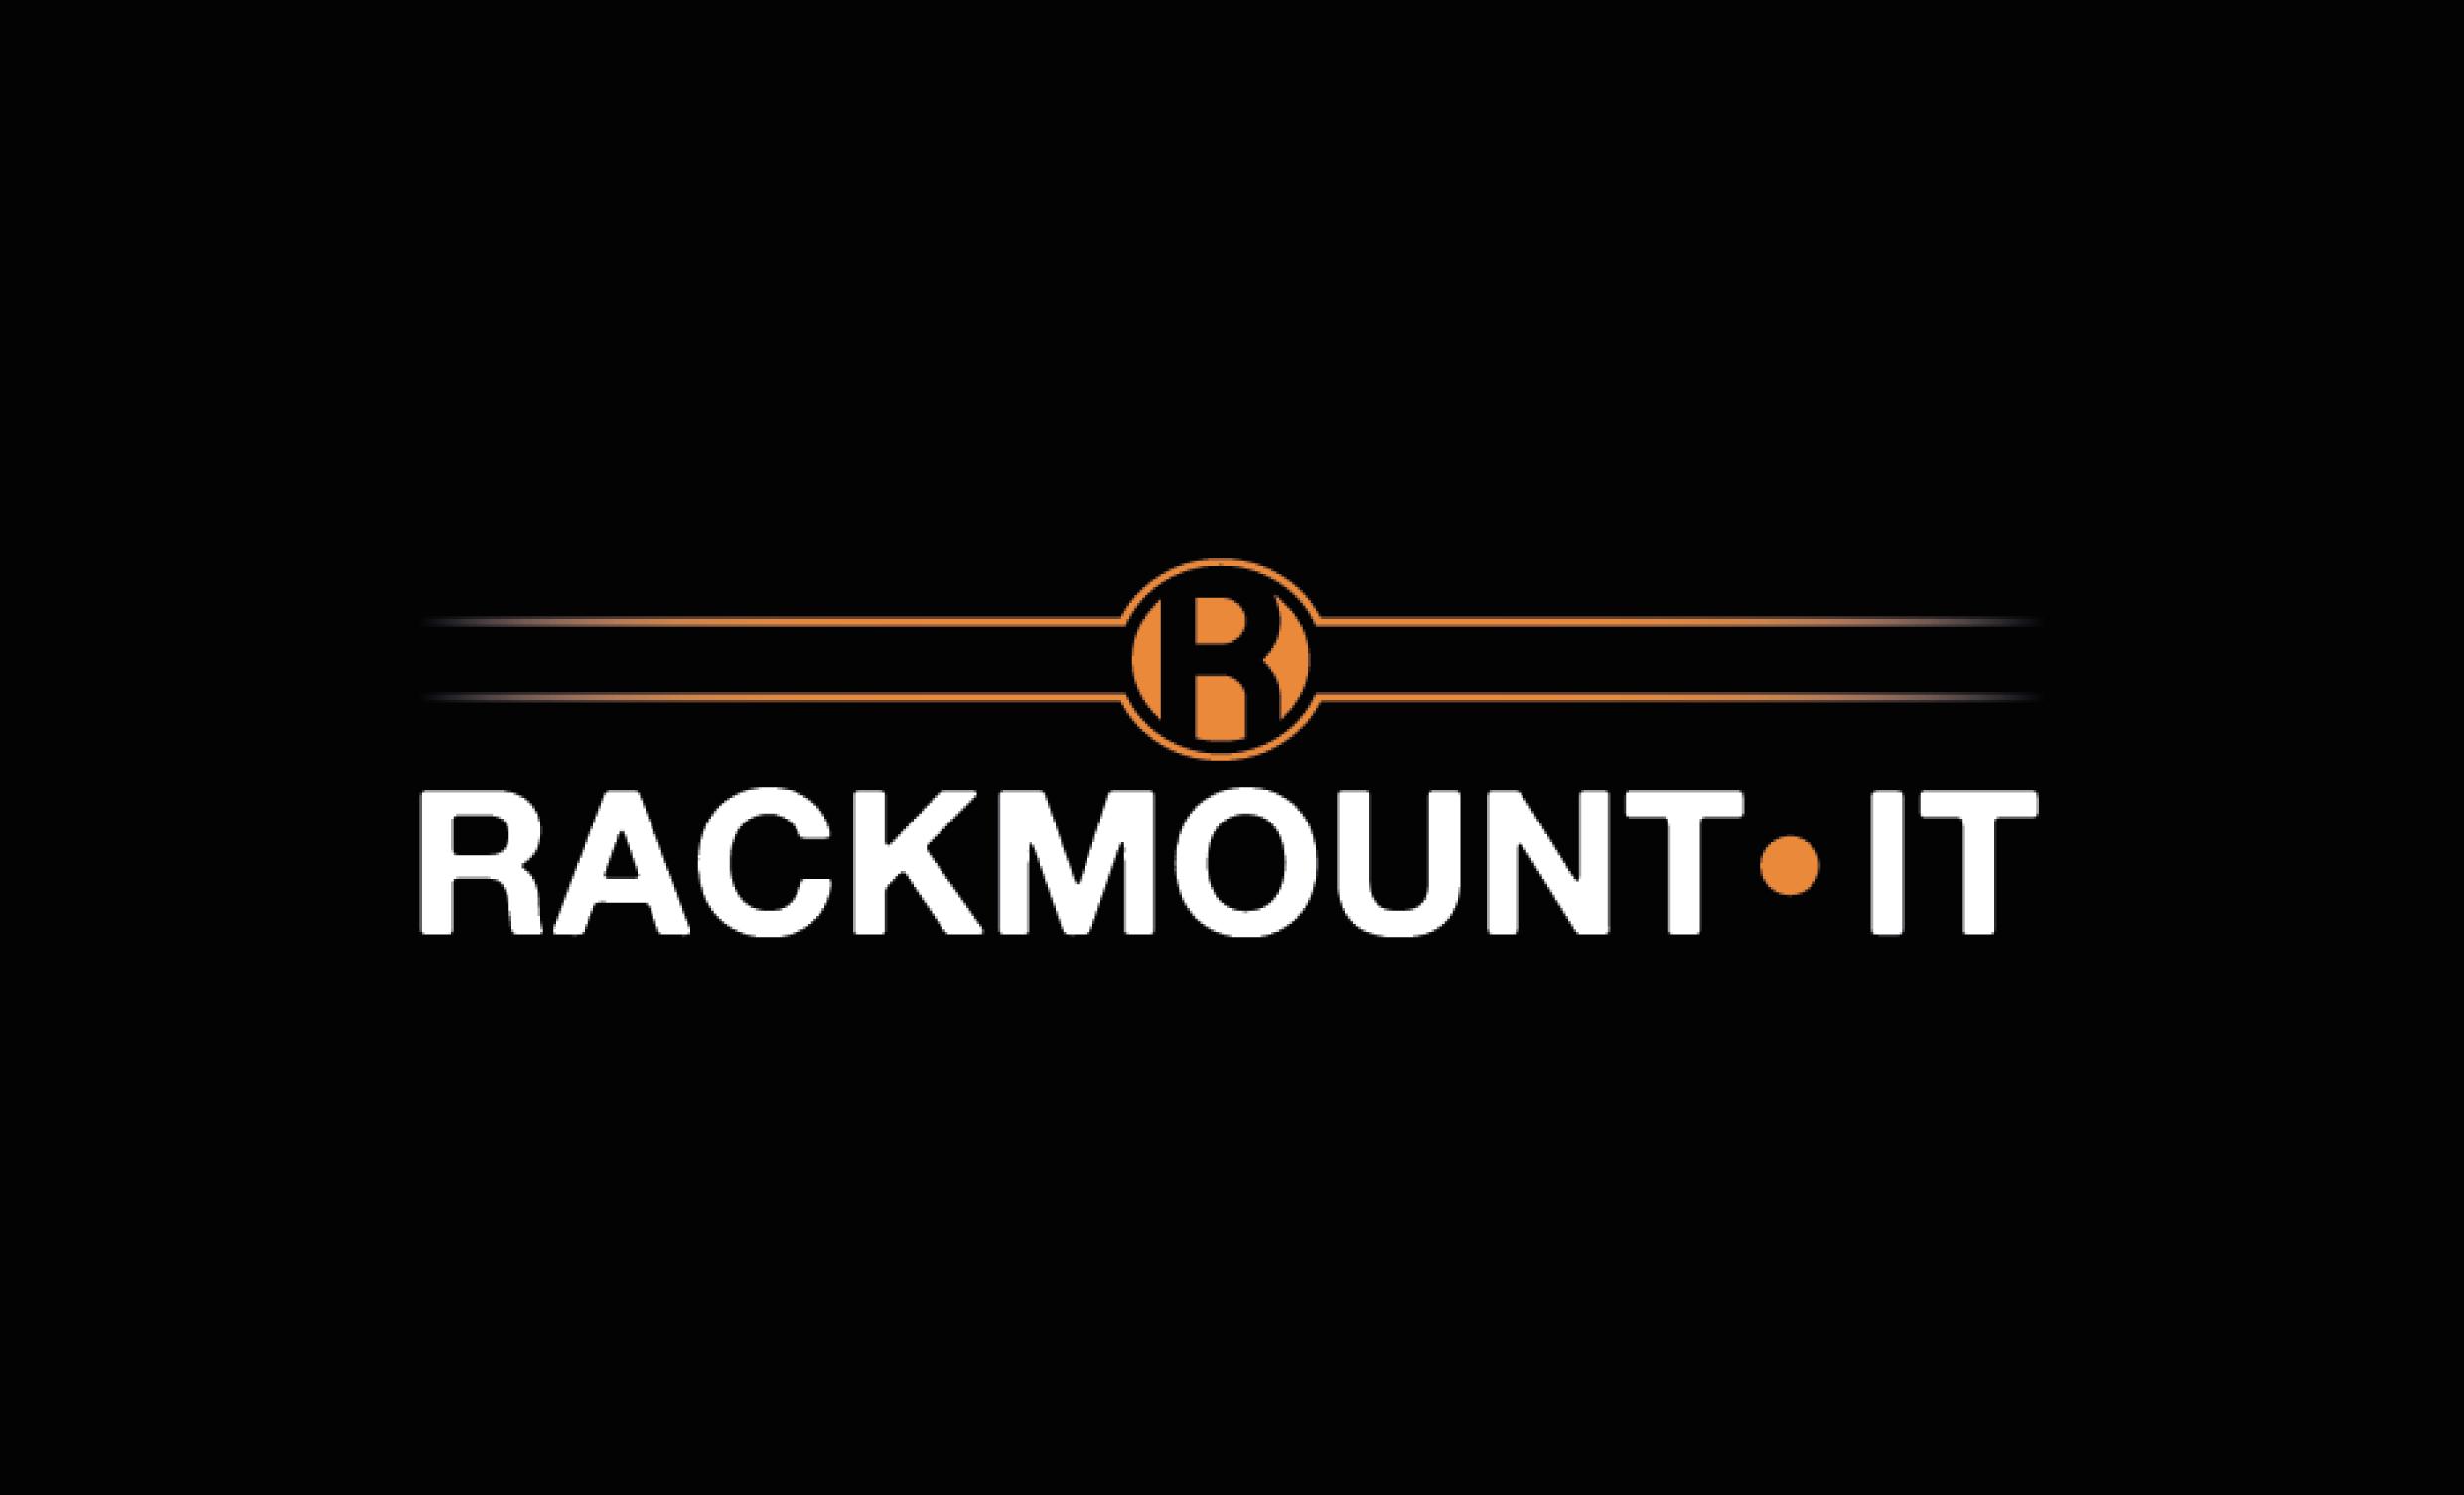 Rackmount_logo_oud_identiteit_typografie